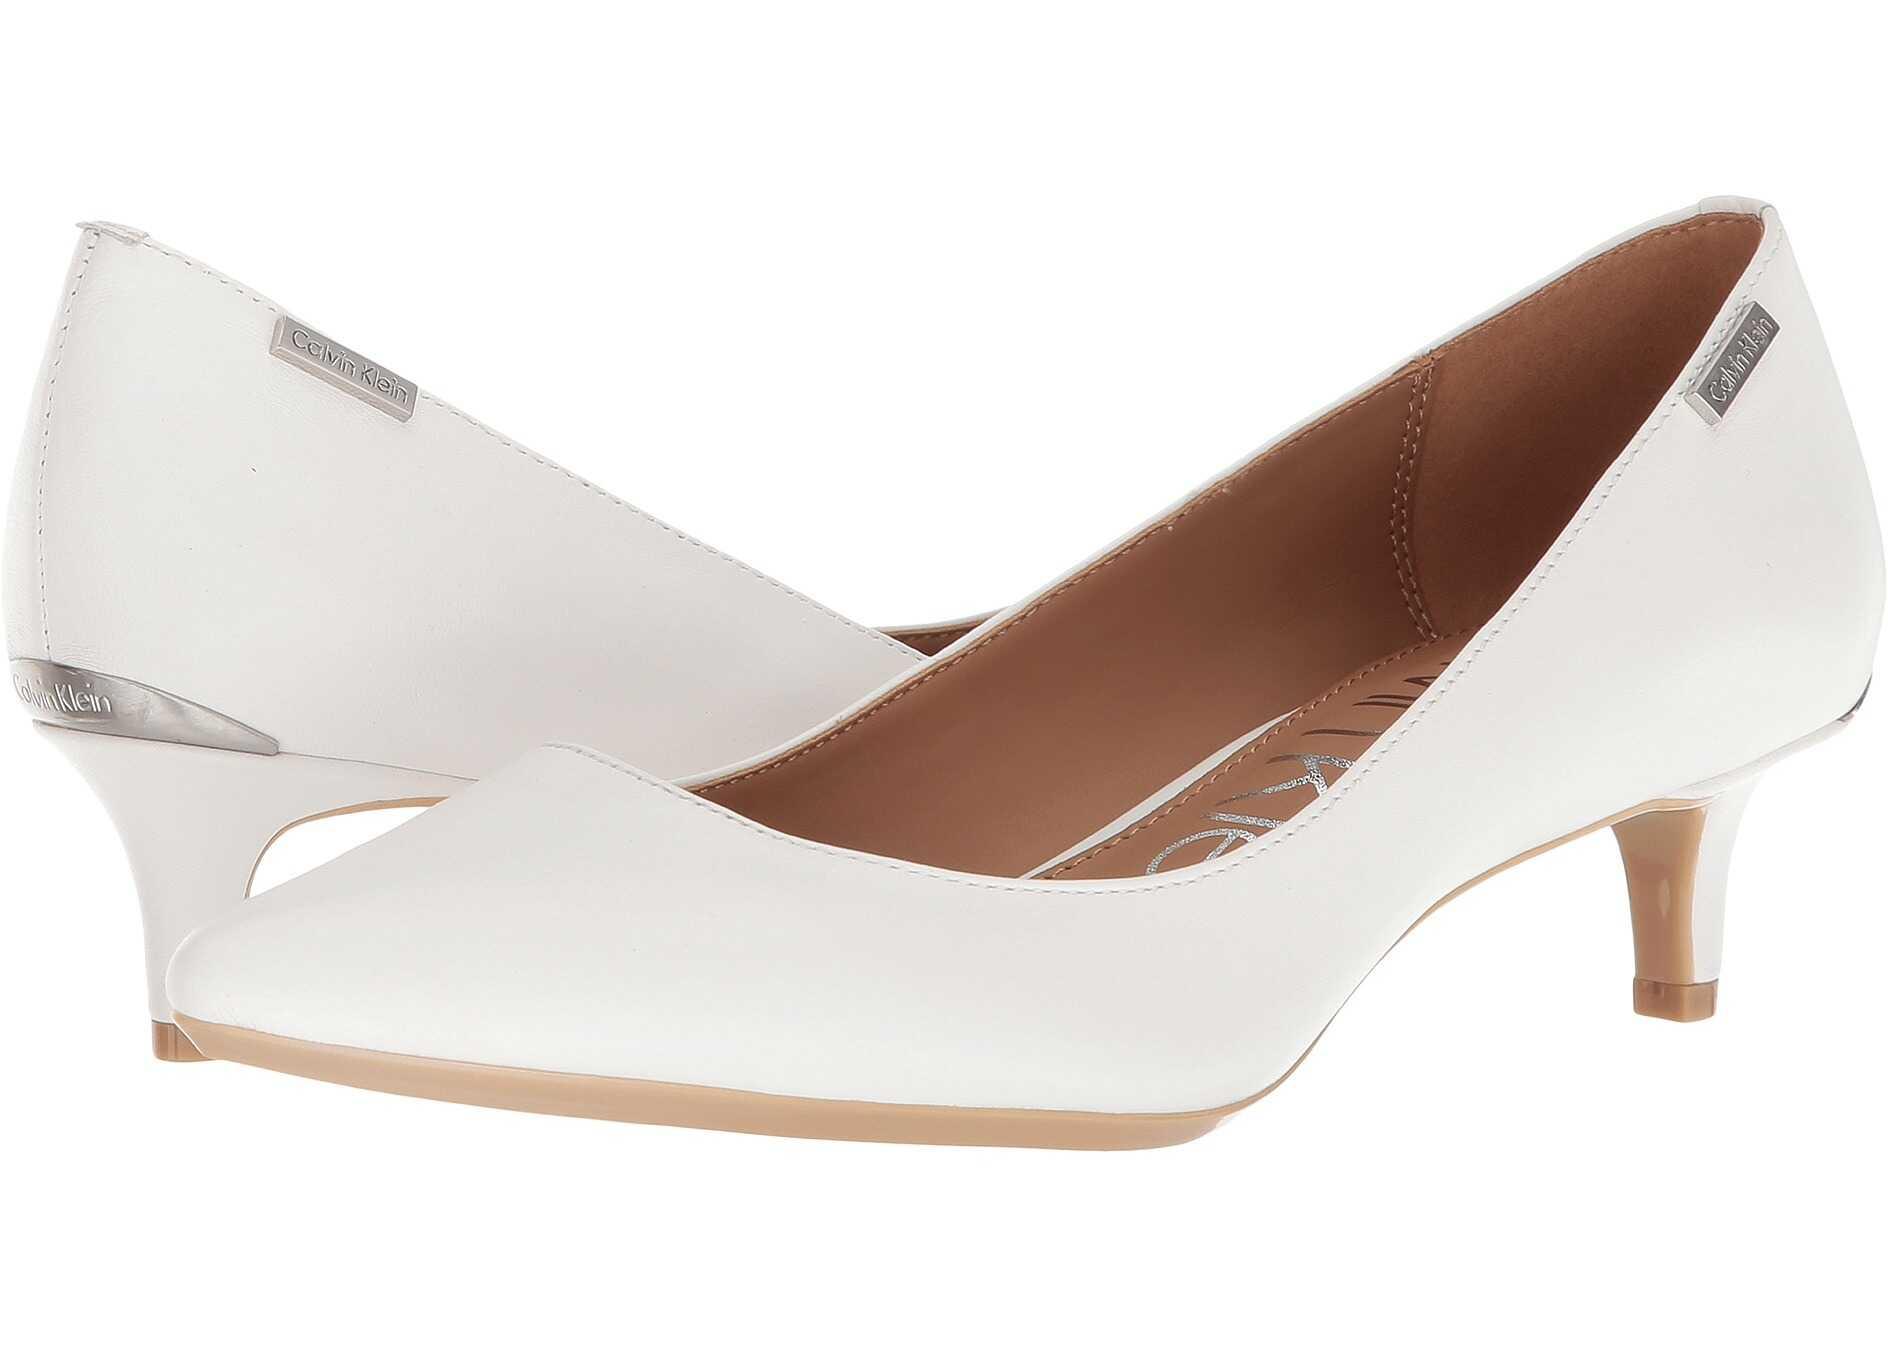 Calvin Klein Gabrianna Pump Platinum White